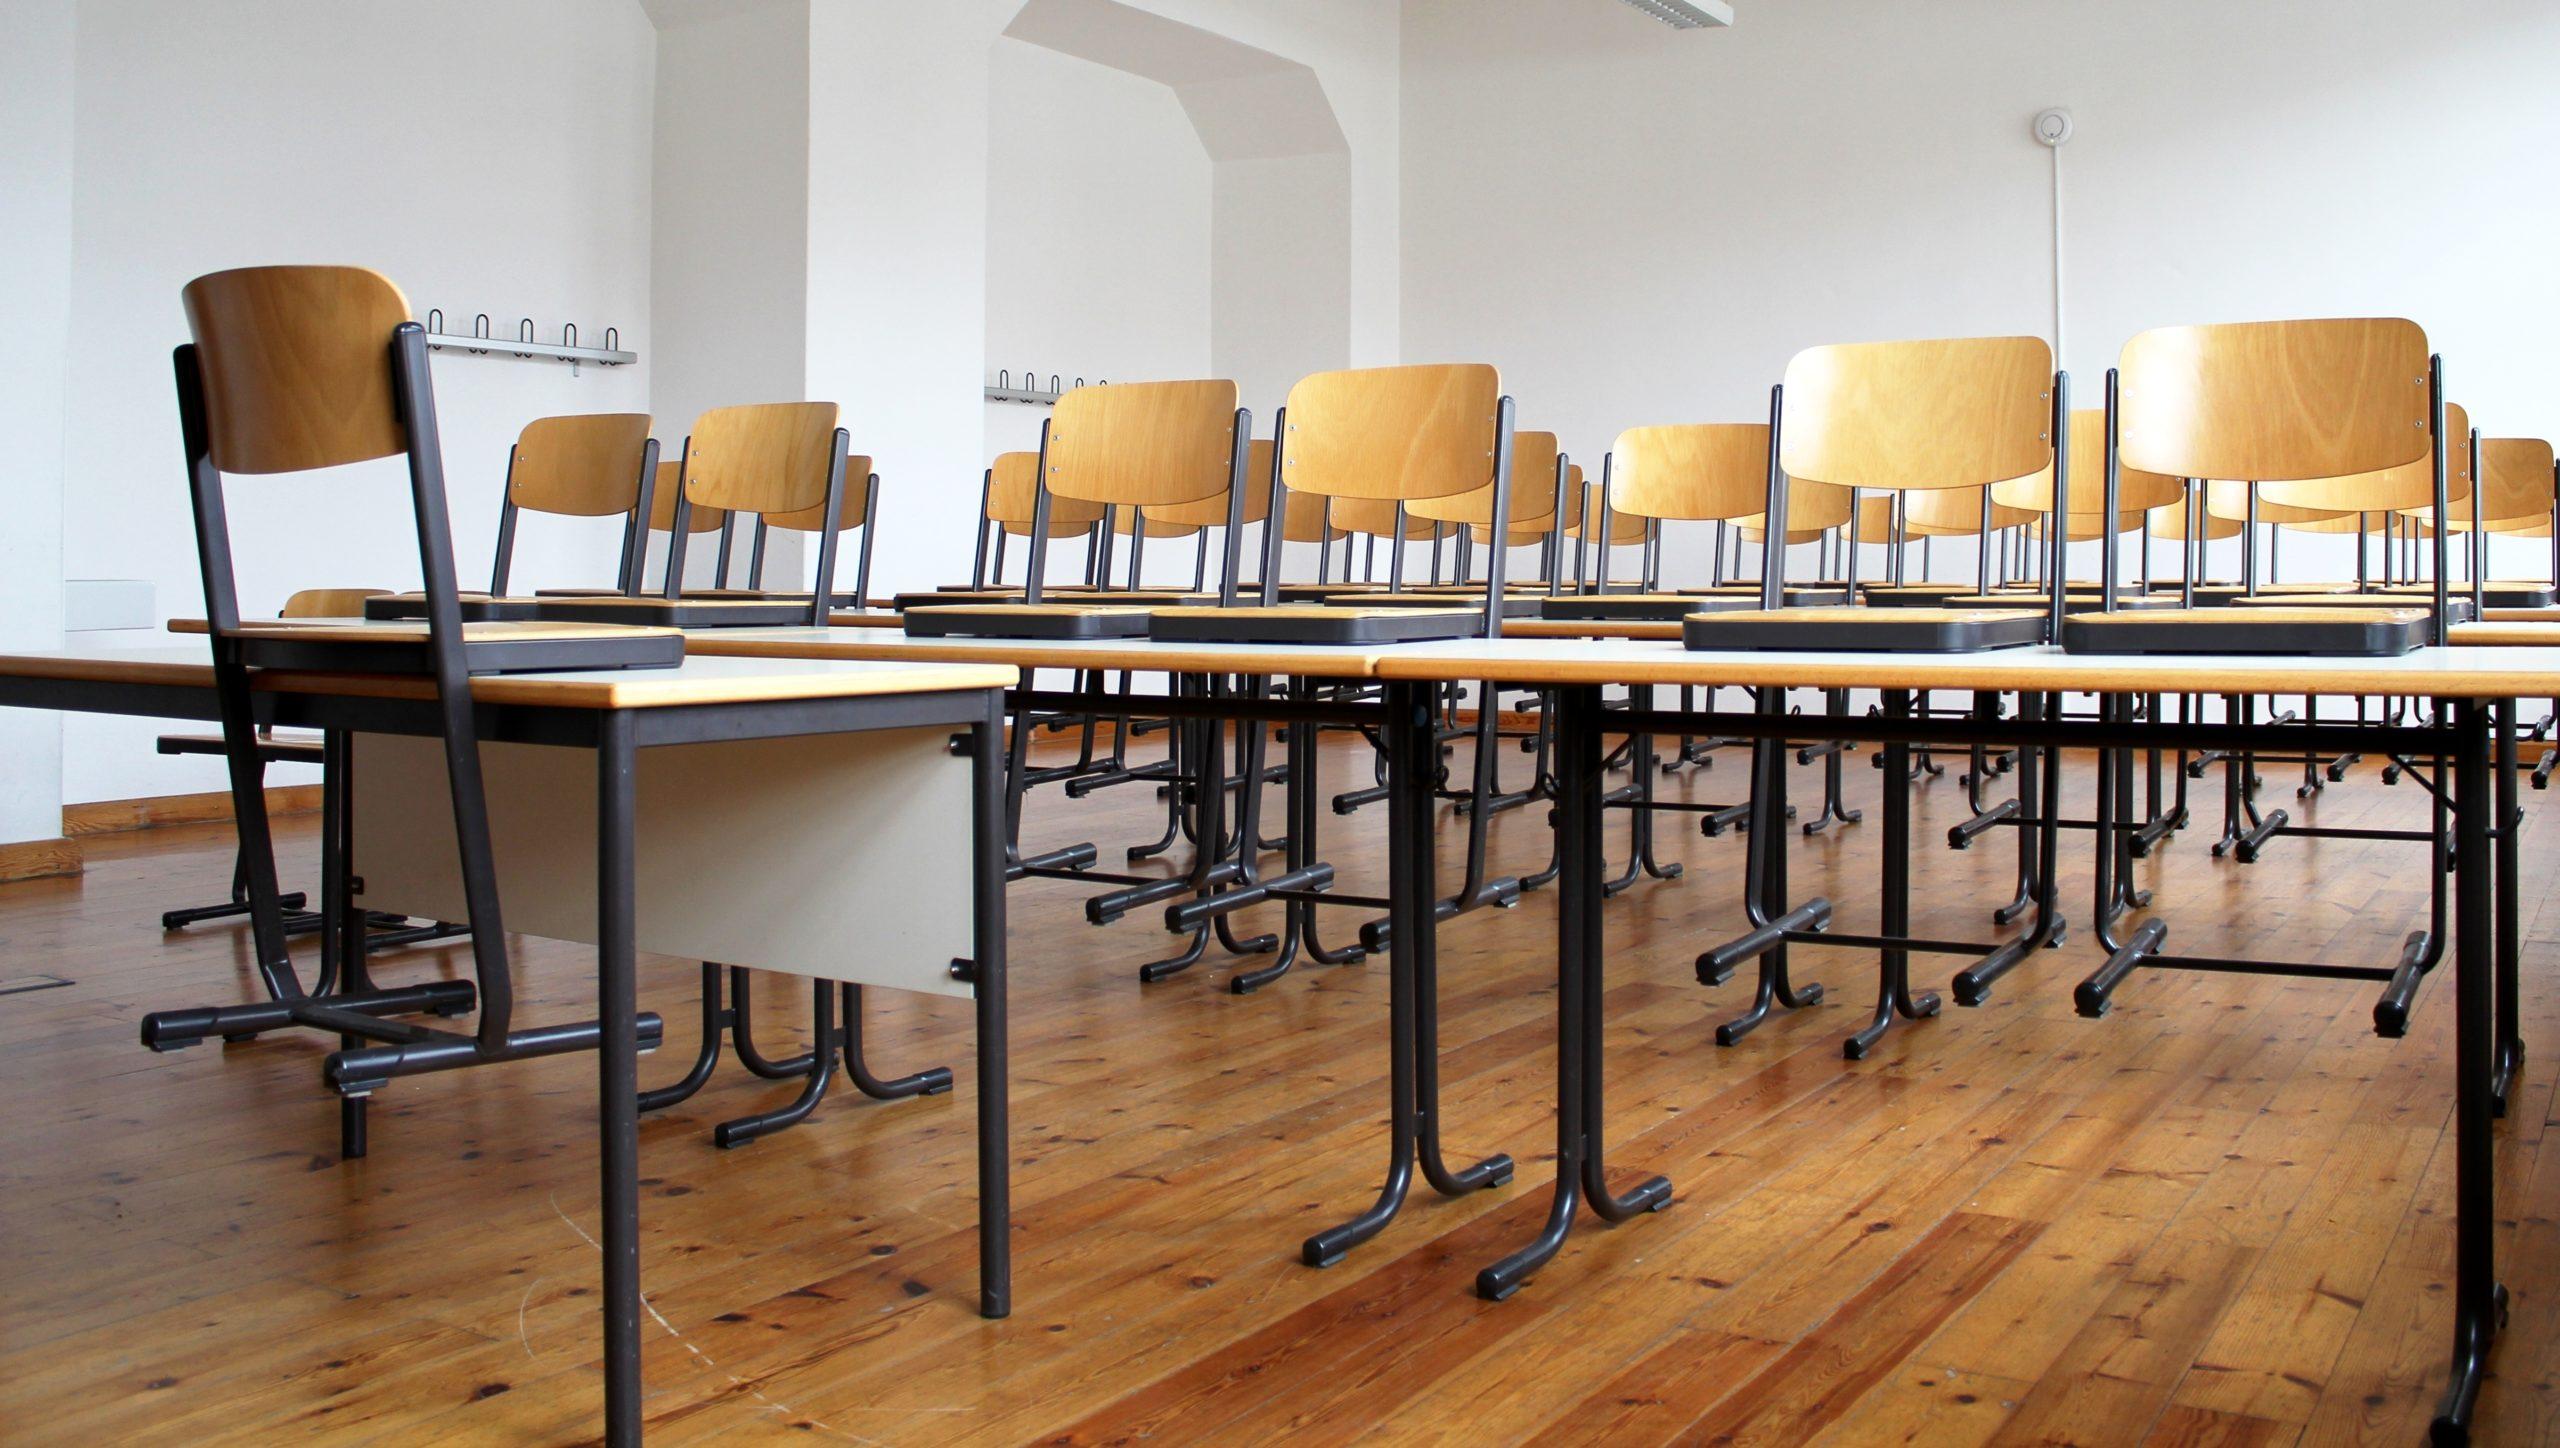 Schule Klassenzimmer